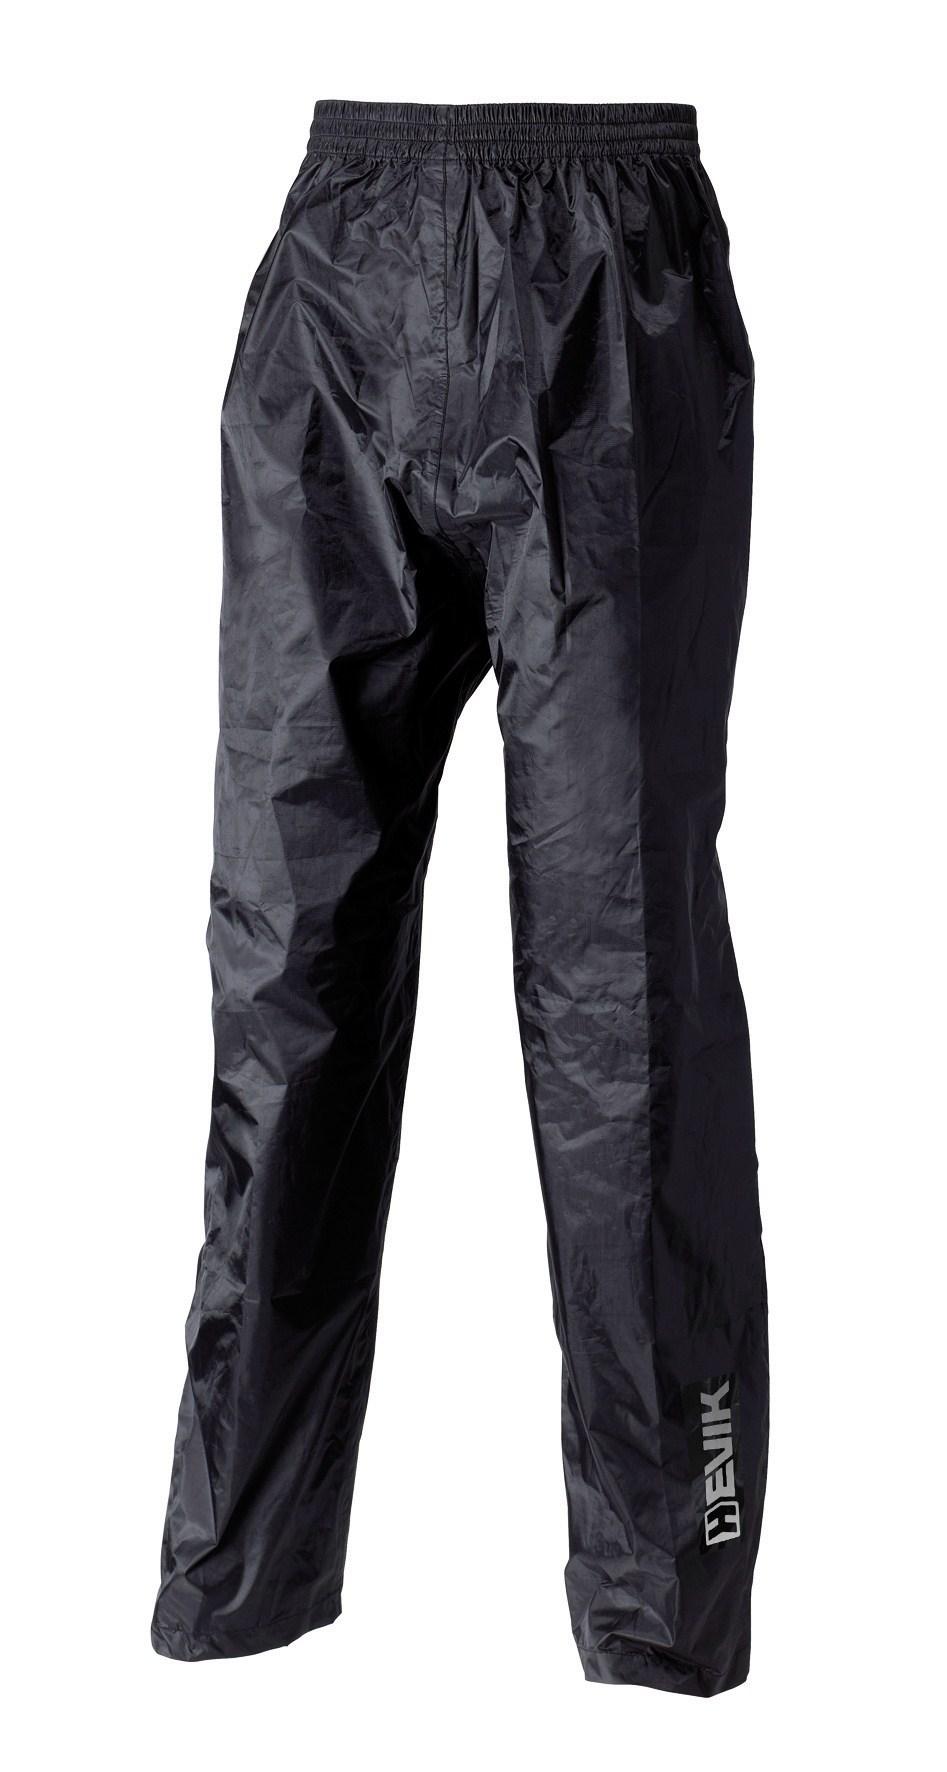 Pantaloni antipioggia Hevik Dry Light Rain Nero